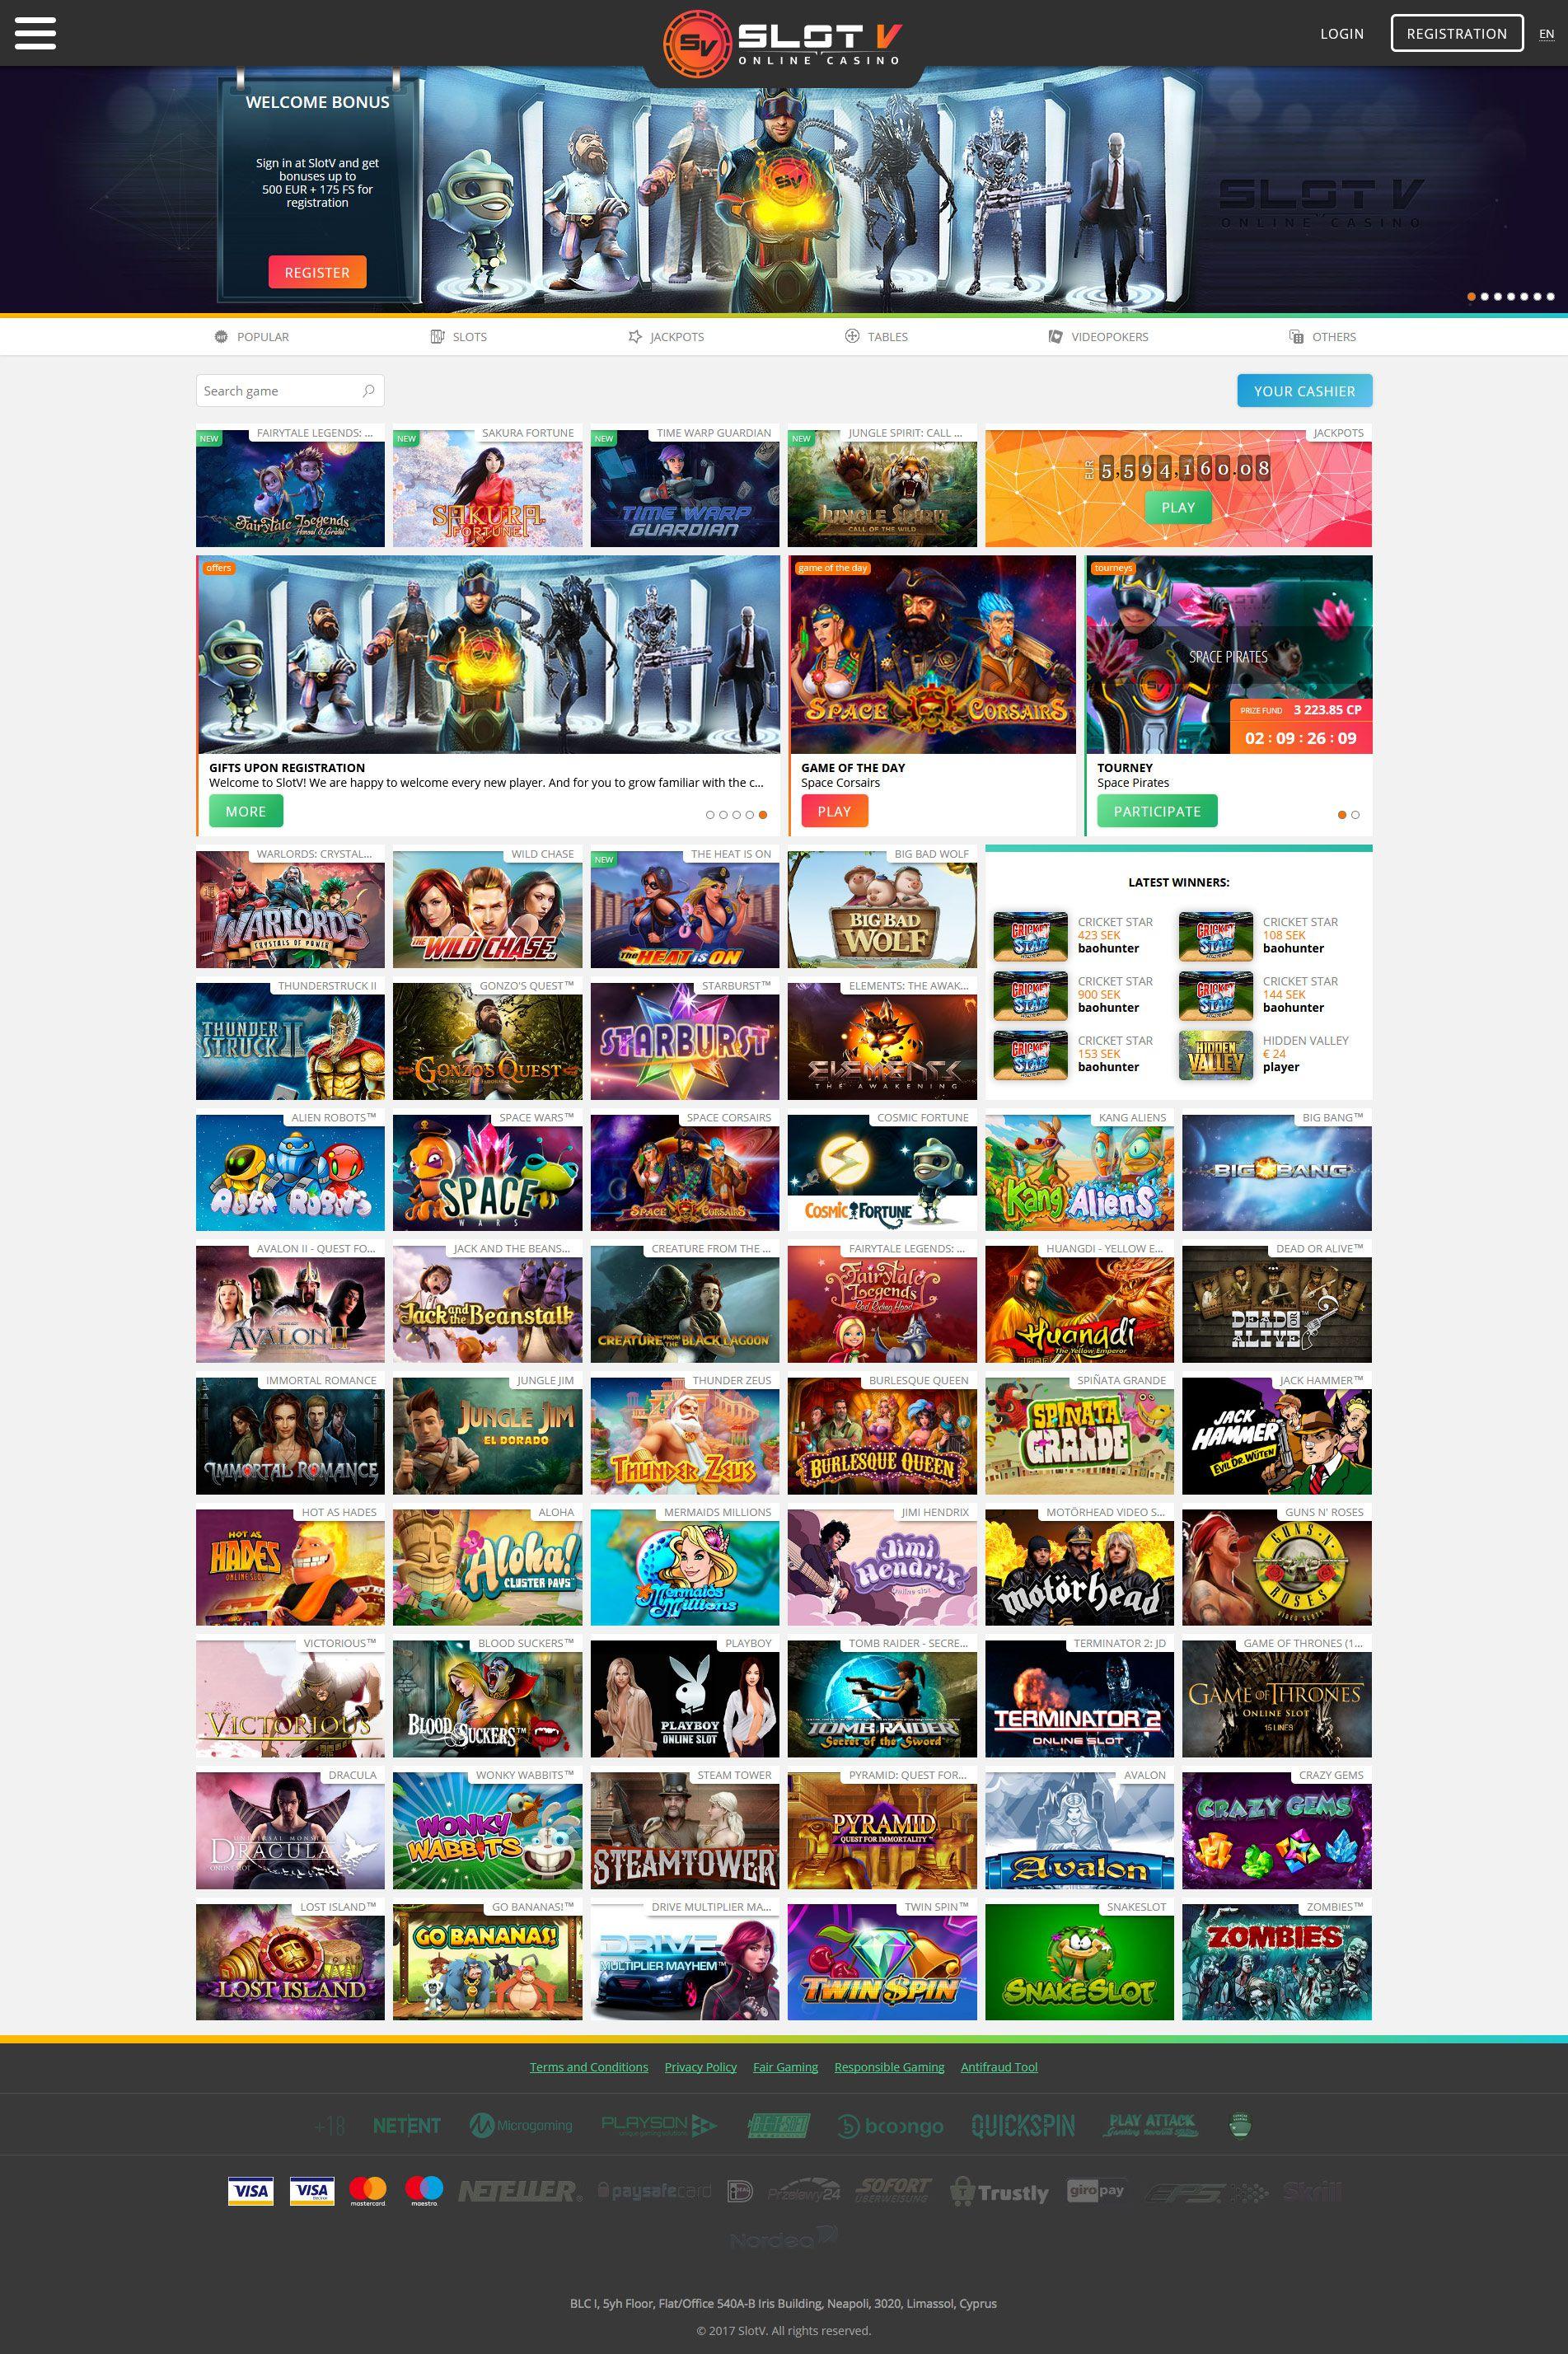 casino slot v официальный сайт 2018